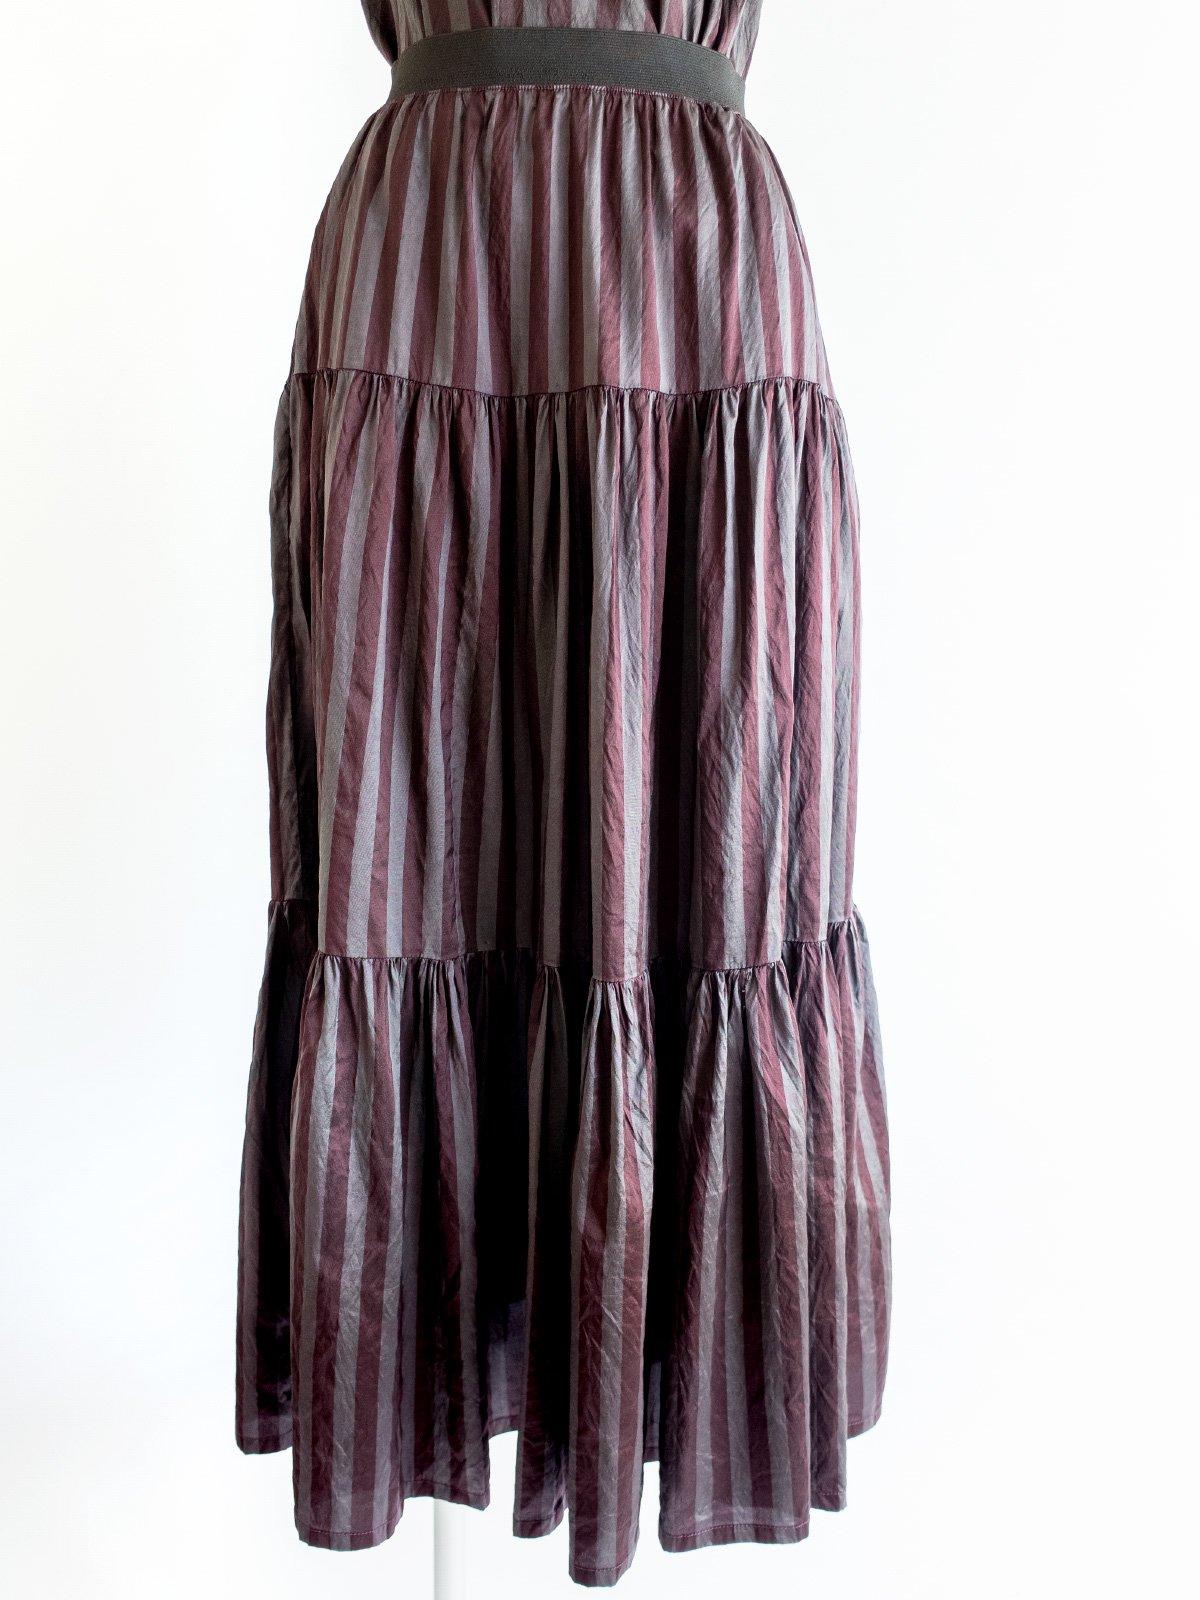 Tiered Skirt / stripe dye サムネイル